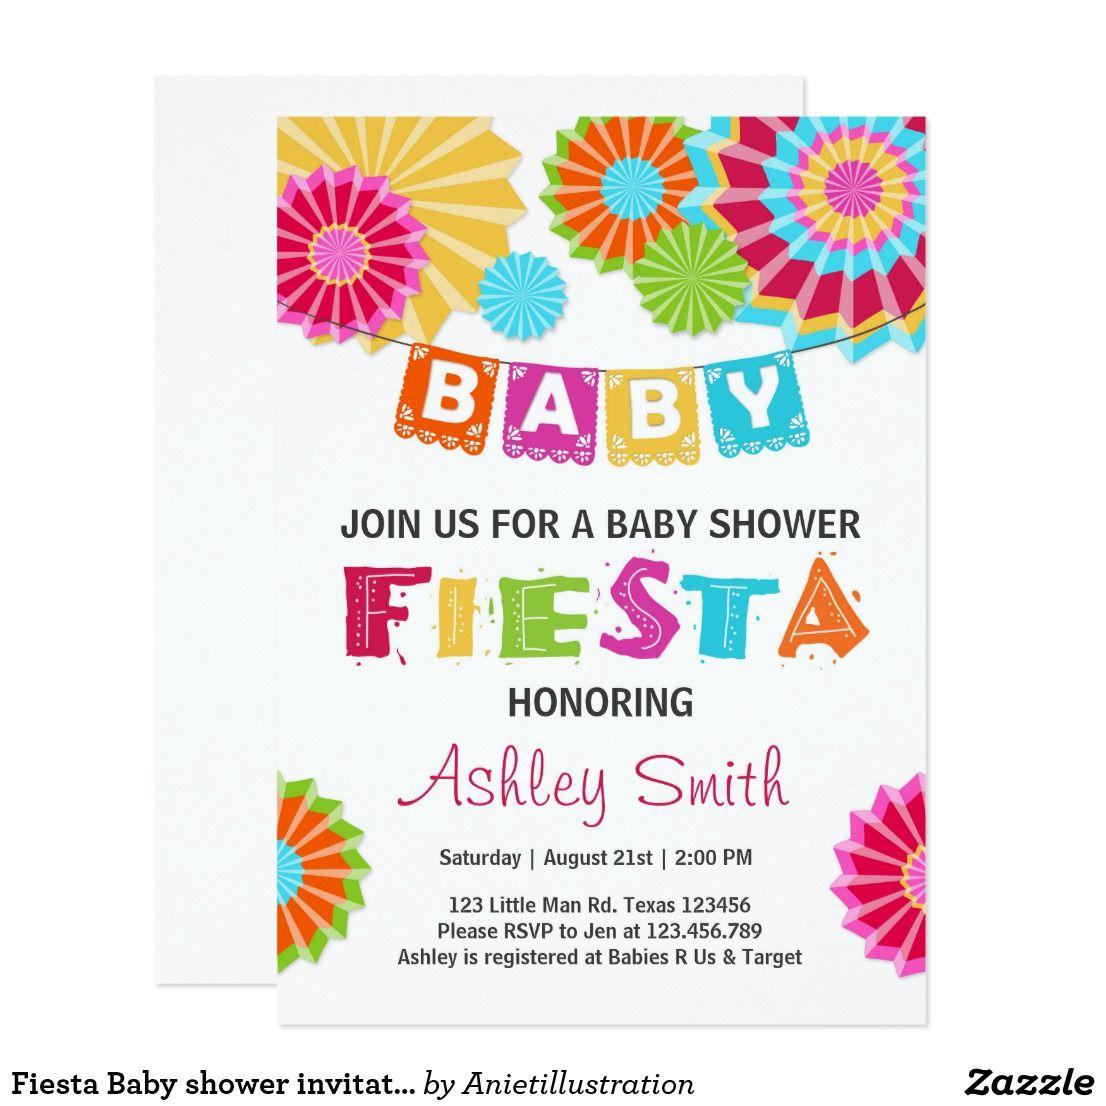 Fiesta Baby shower invitation Mexican baby shower | Baby | Pinterest ...